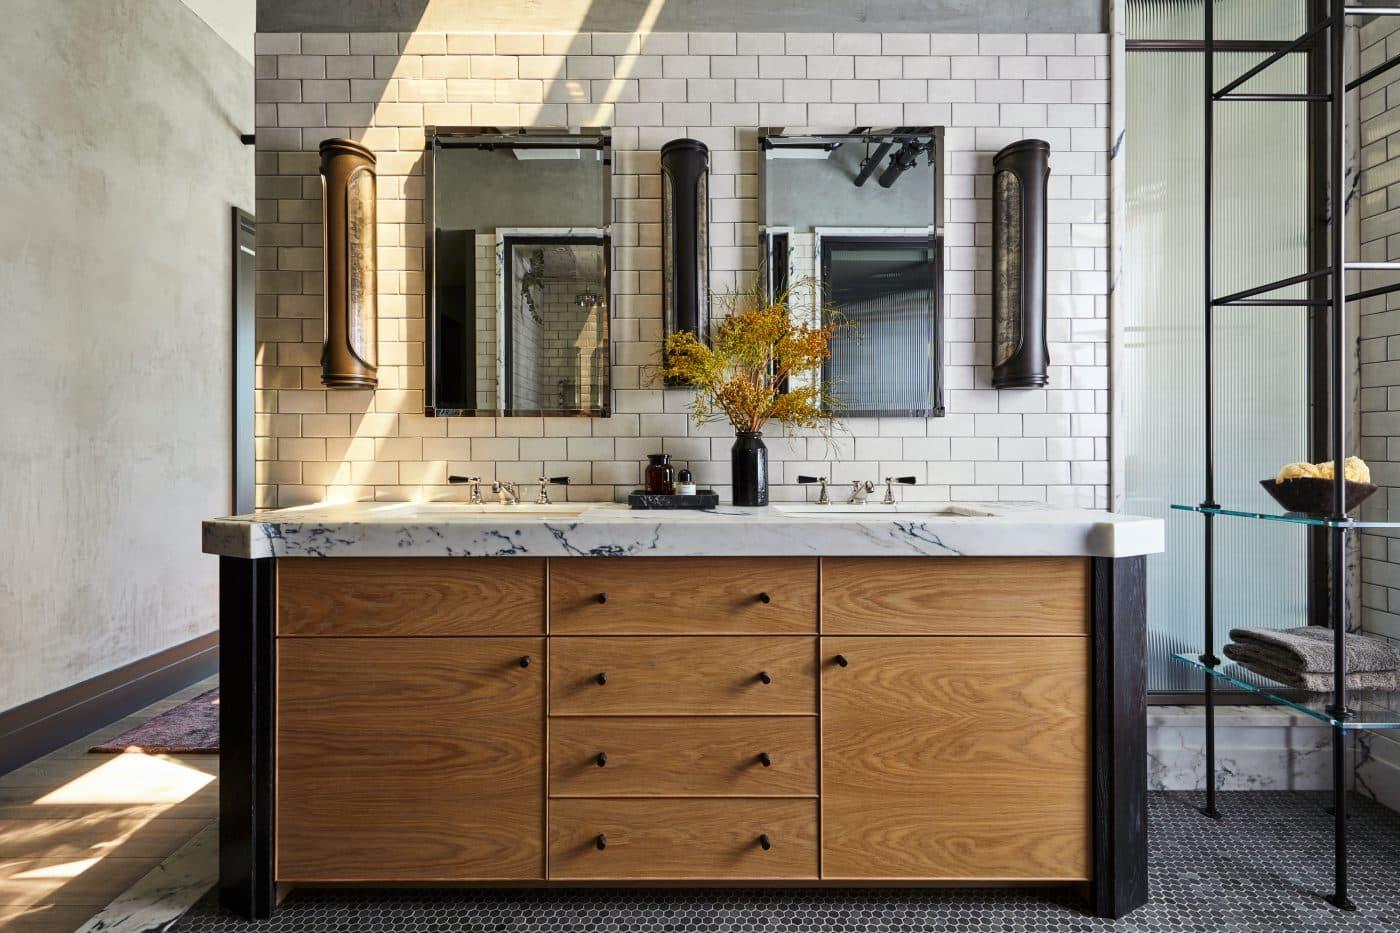 A custom bathroom vanity designed by Jesse Parris-Lamb